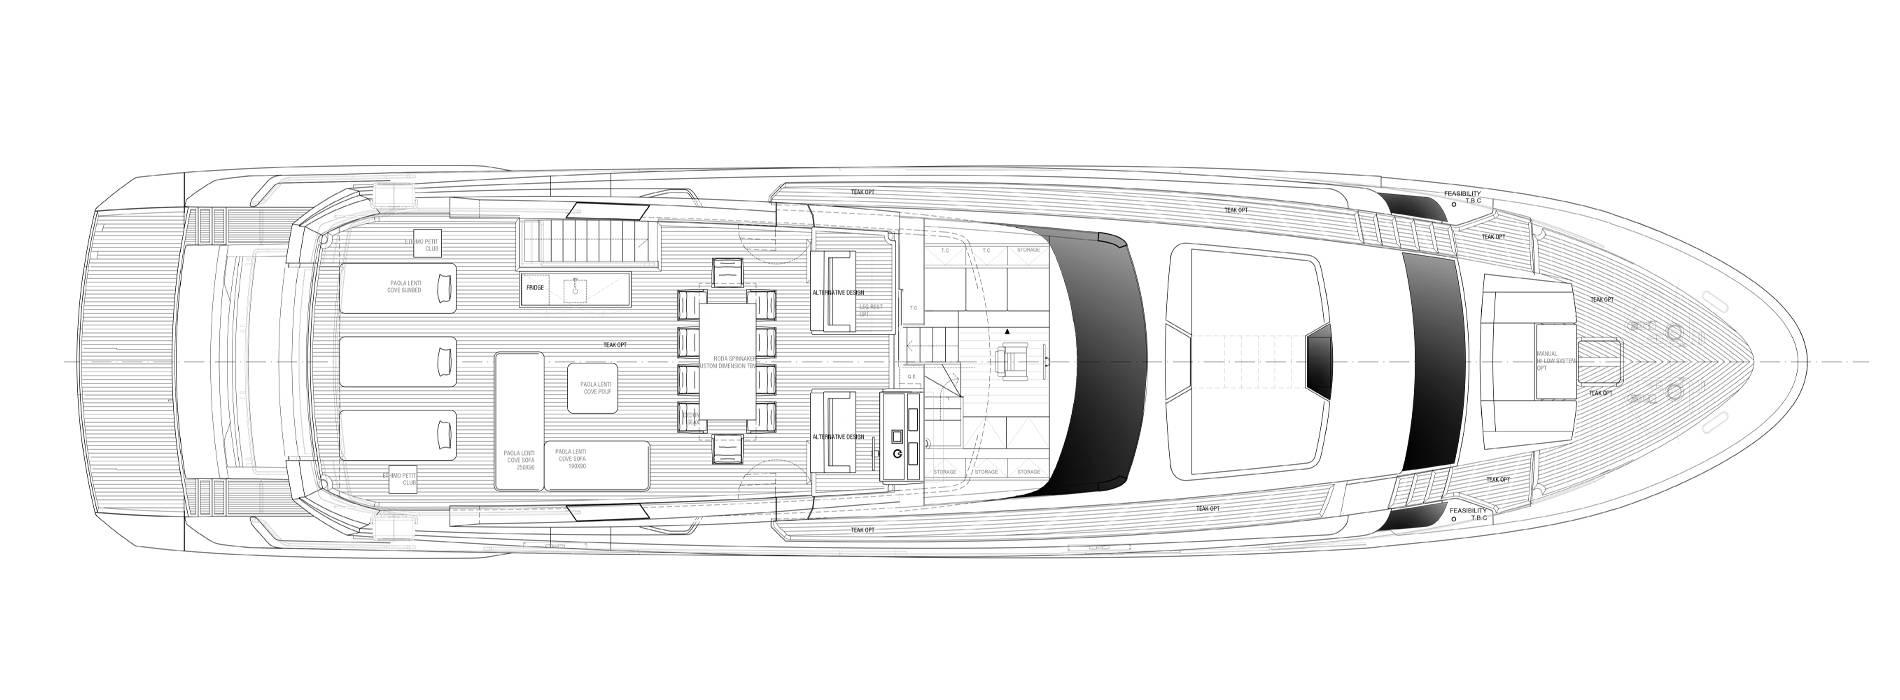 Sanlorenzo Yachts SL102A-746 Flying bridge